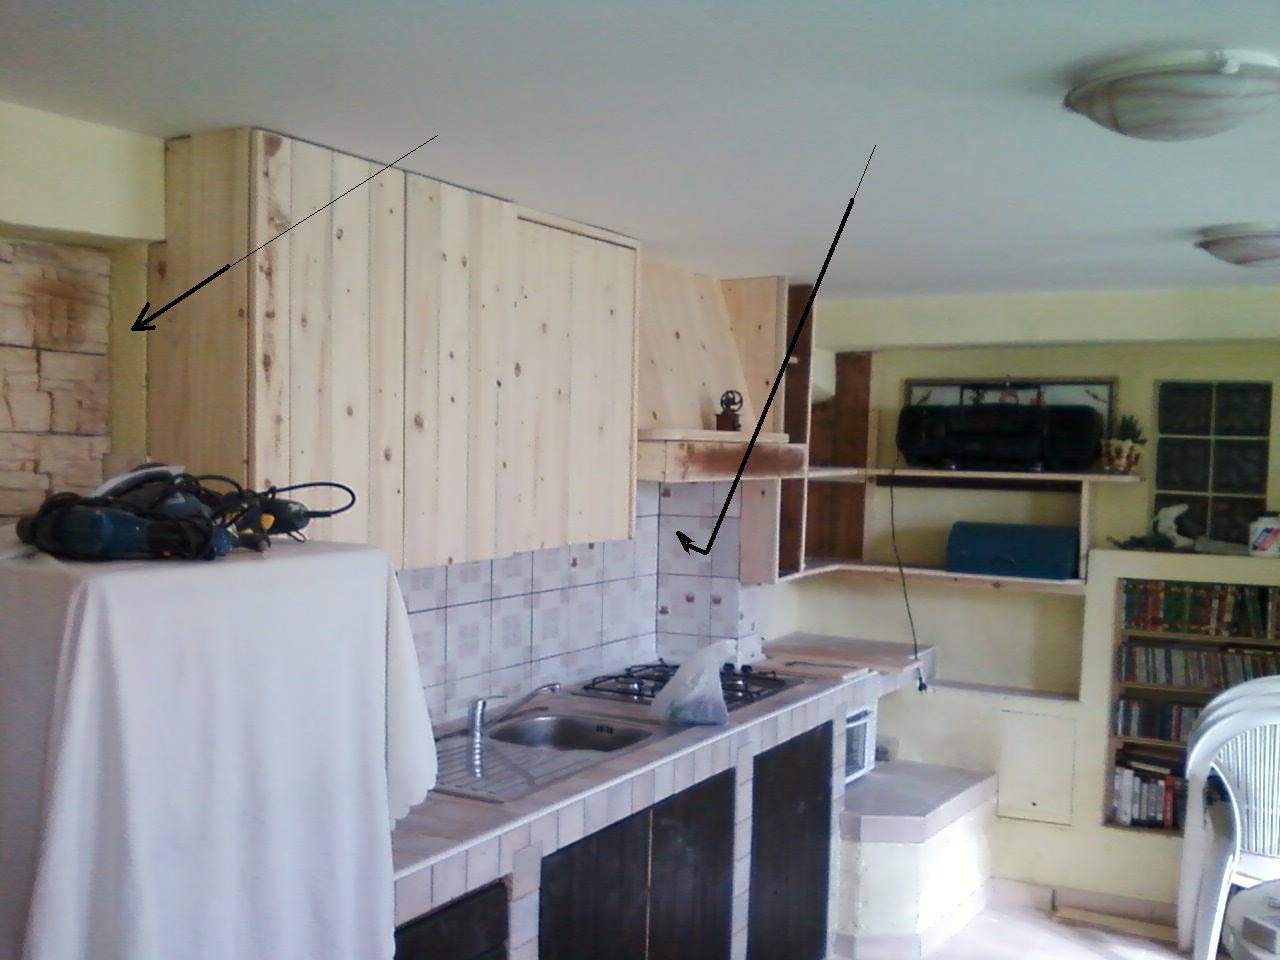 Arredamento cucina udine : arredamento bagni rustici. arredamento ...